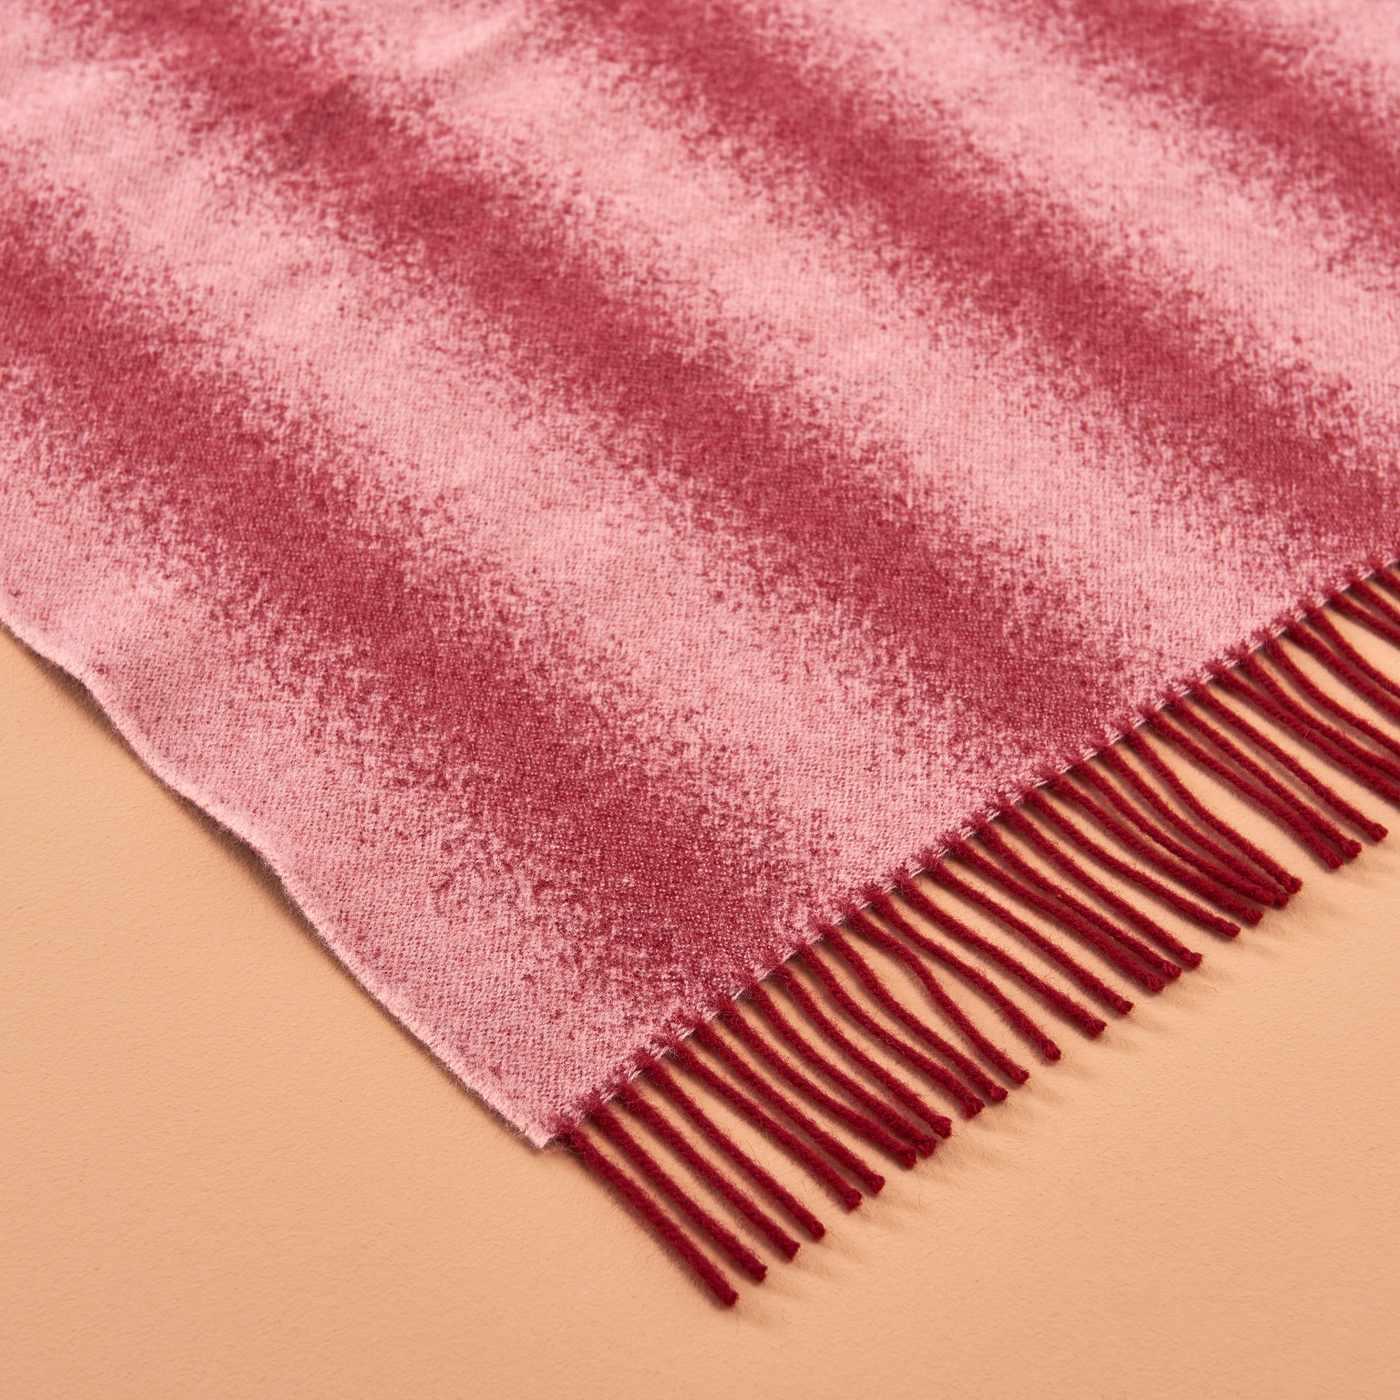 Burgundy and Blush Tide Blanket | Bombinate